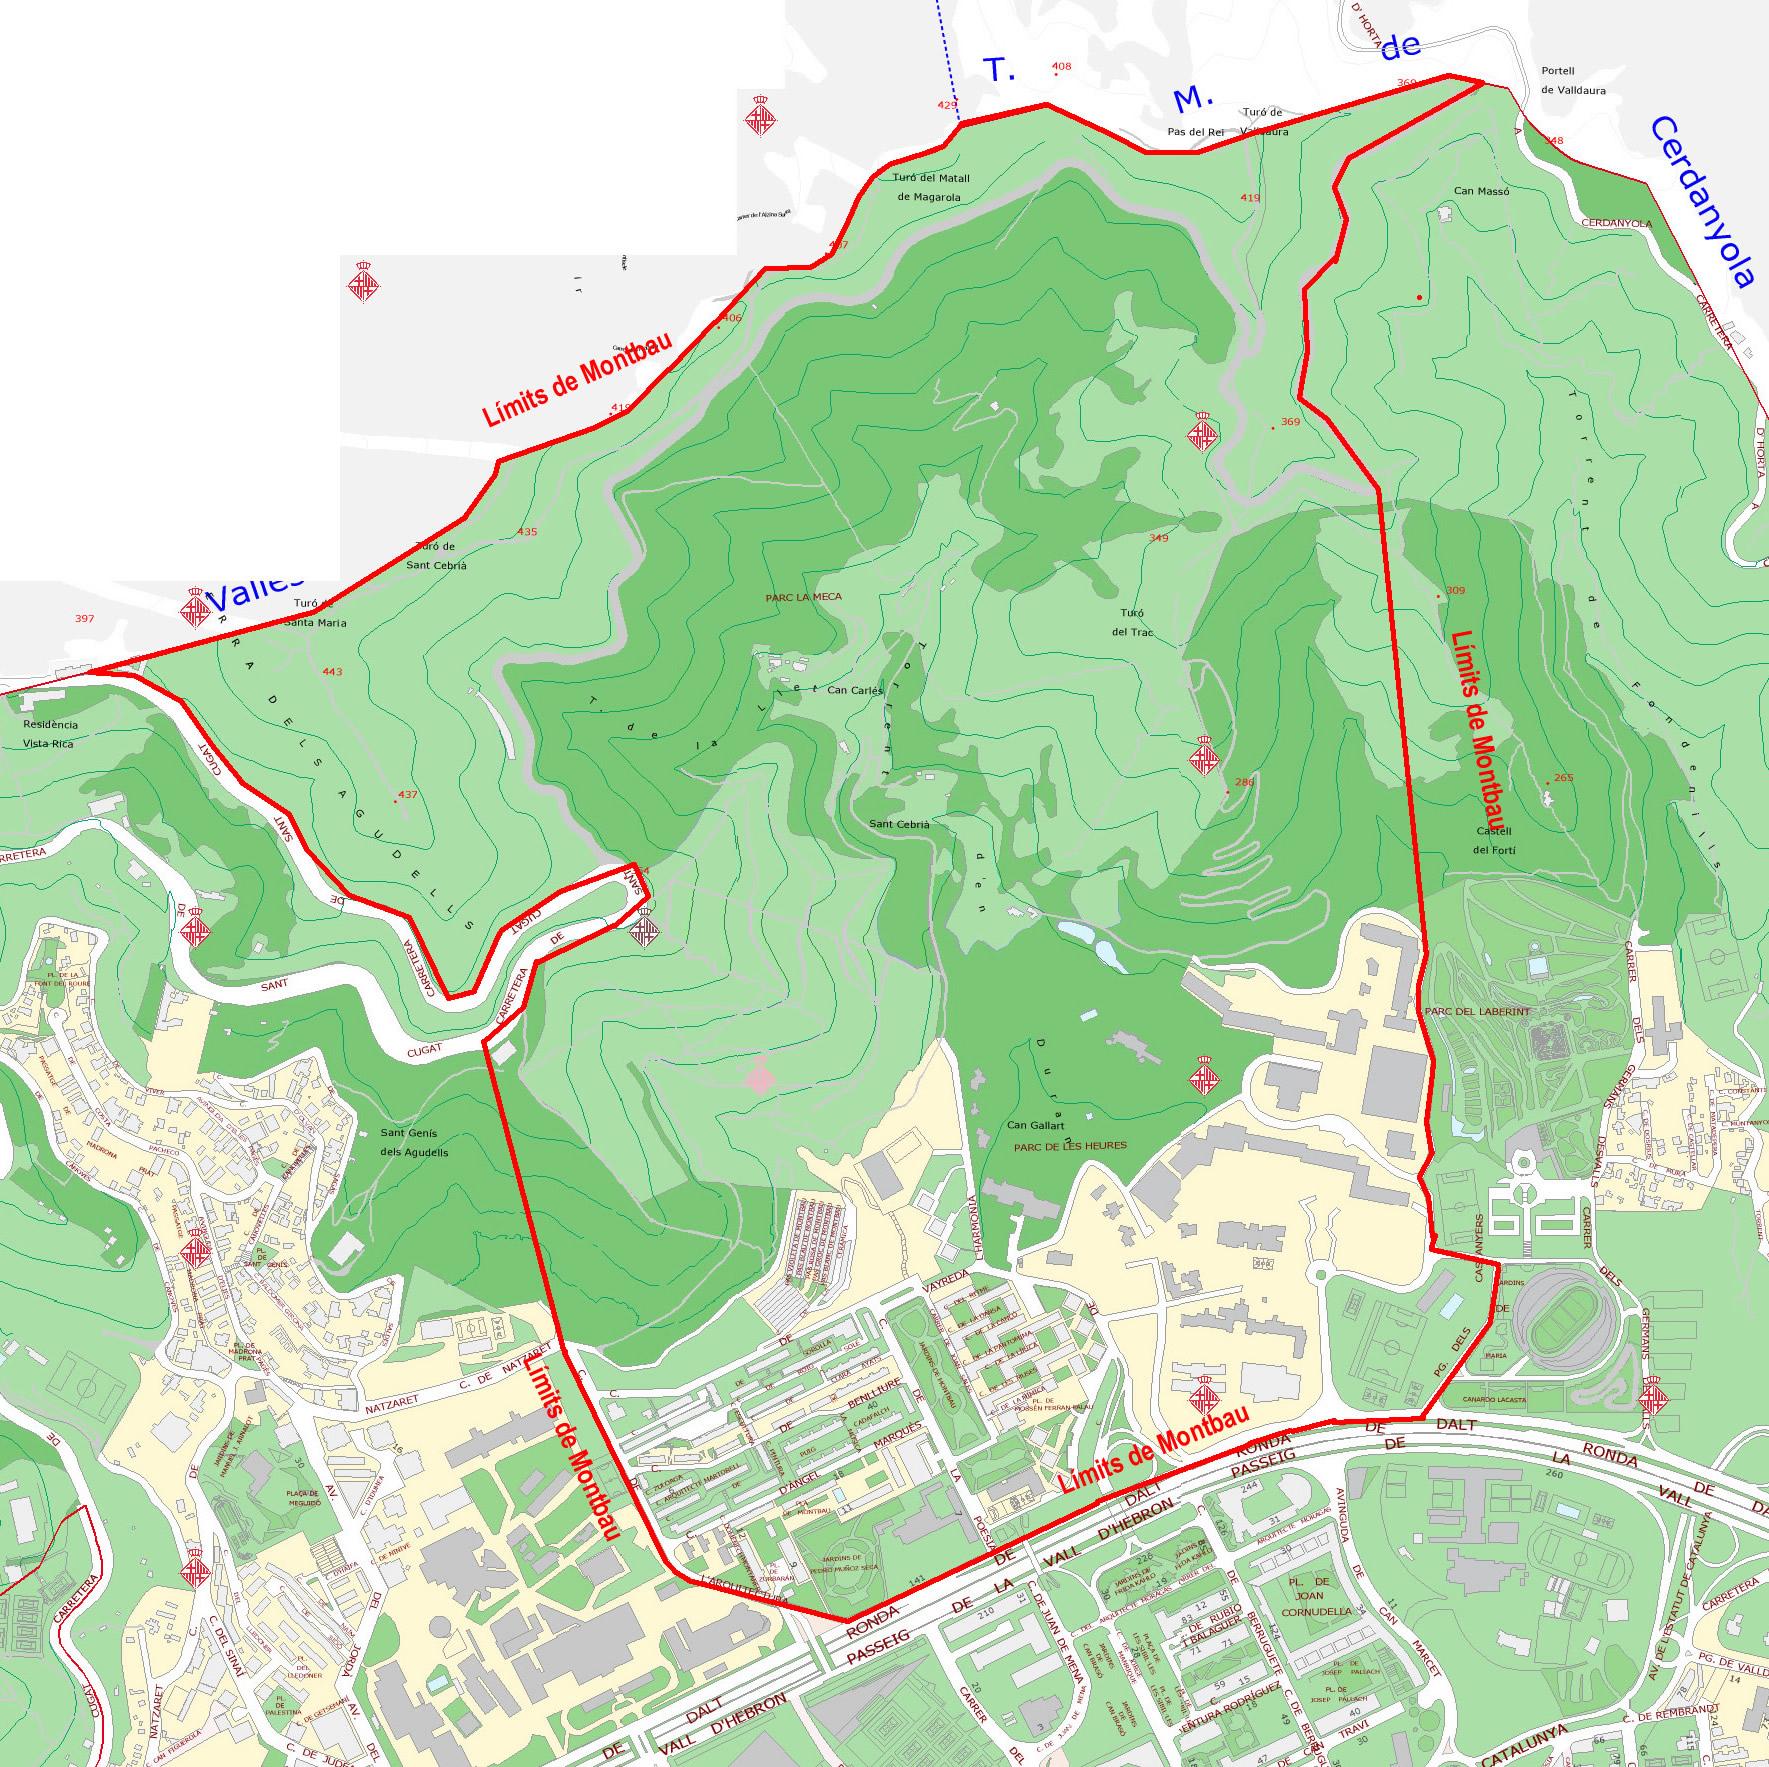 Mapa de Montbau